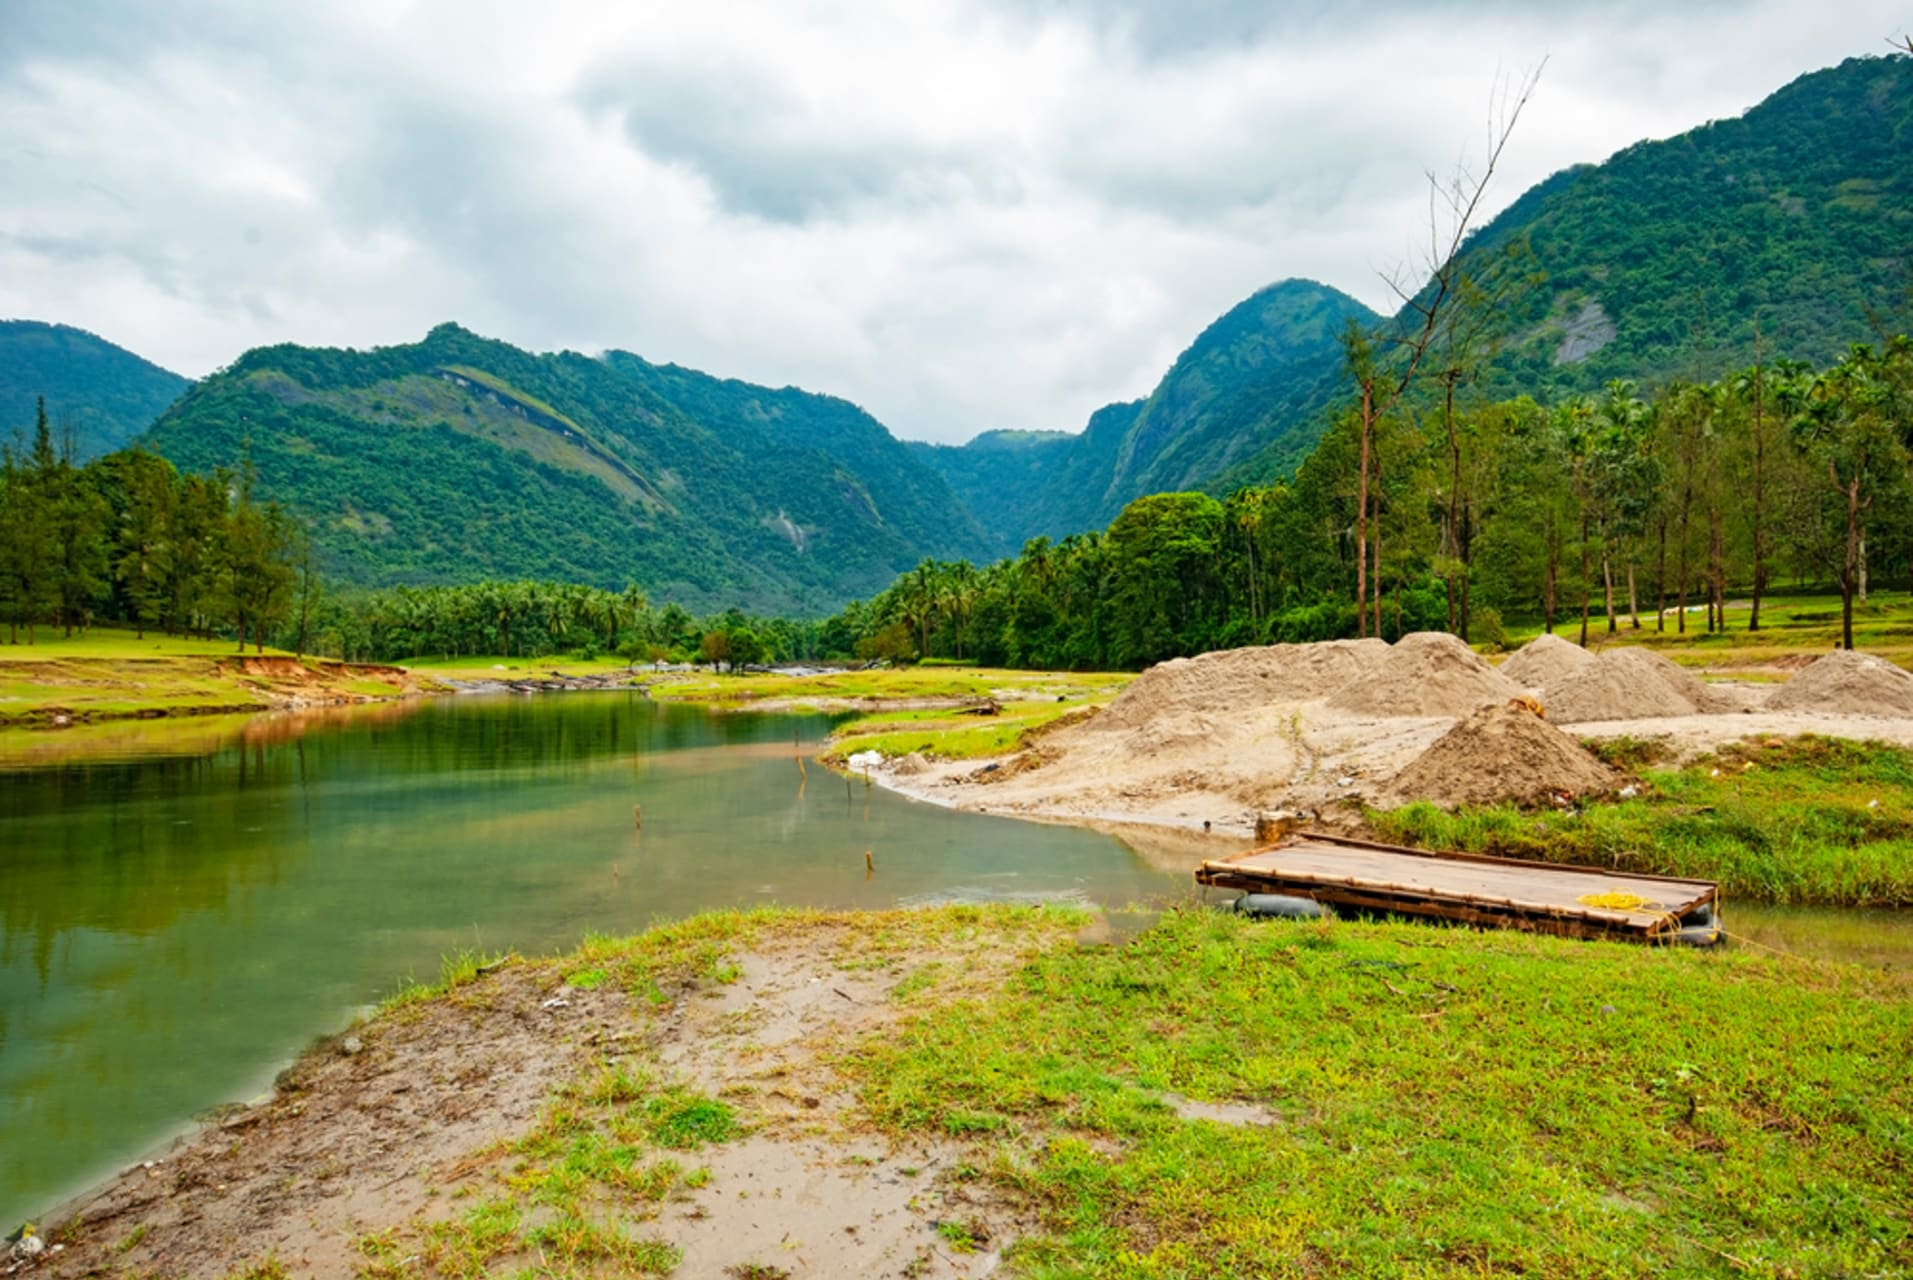 Kerala - Kerala - Natural Beauty of a Village (Part 3)